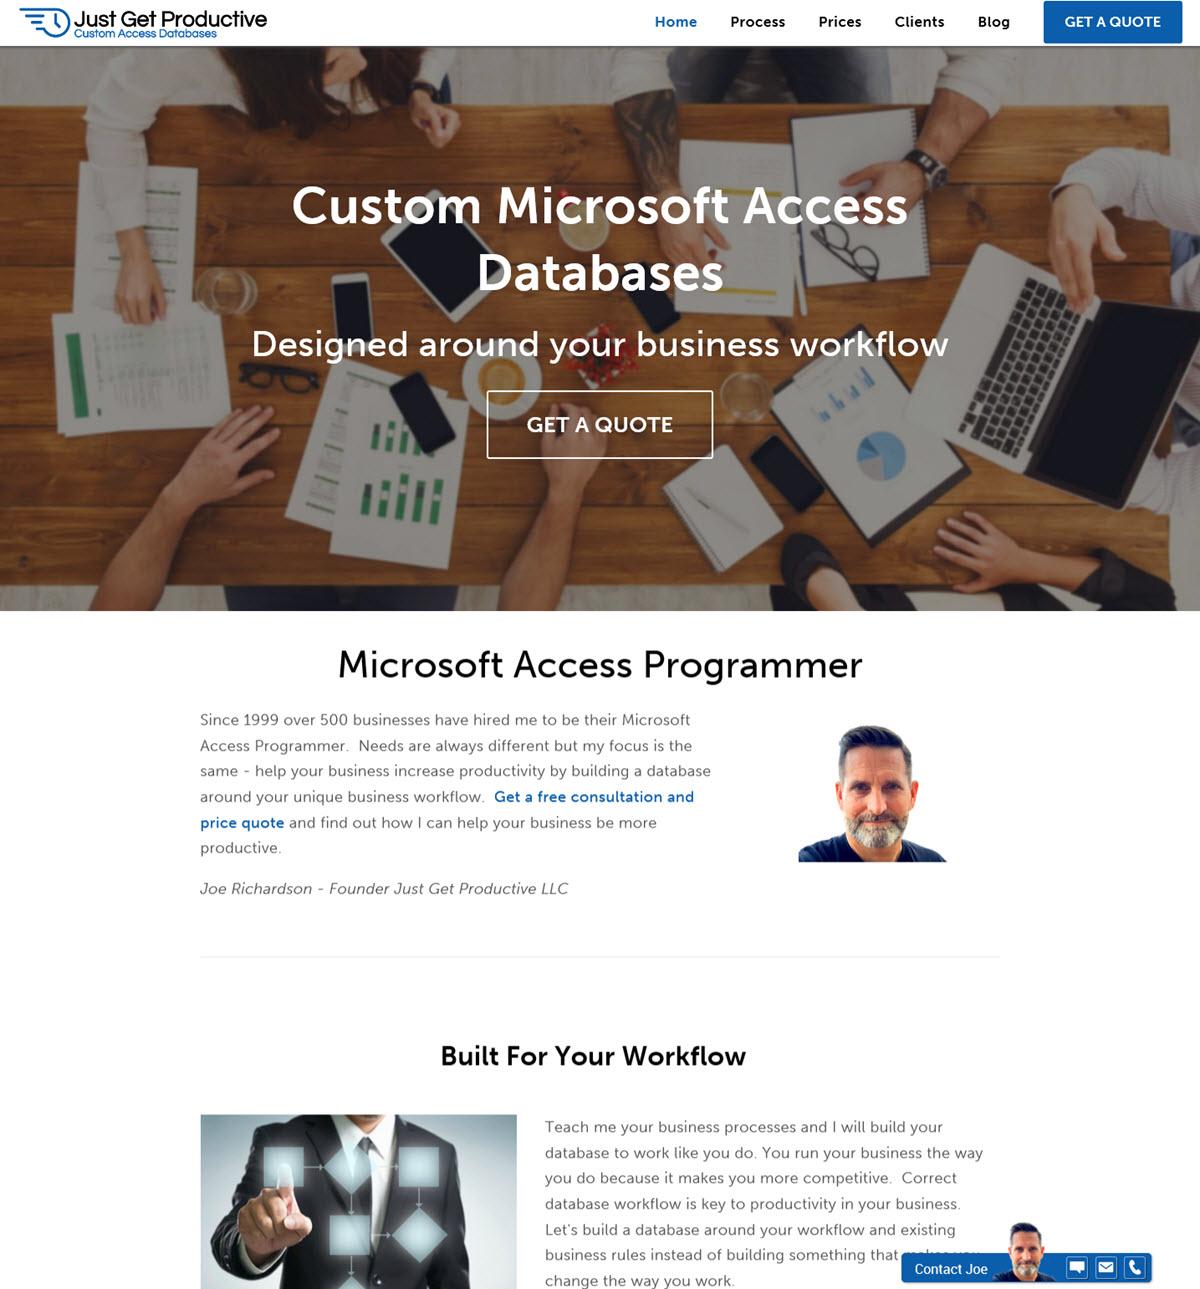 Screenshot of new website